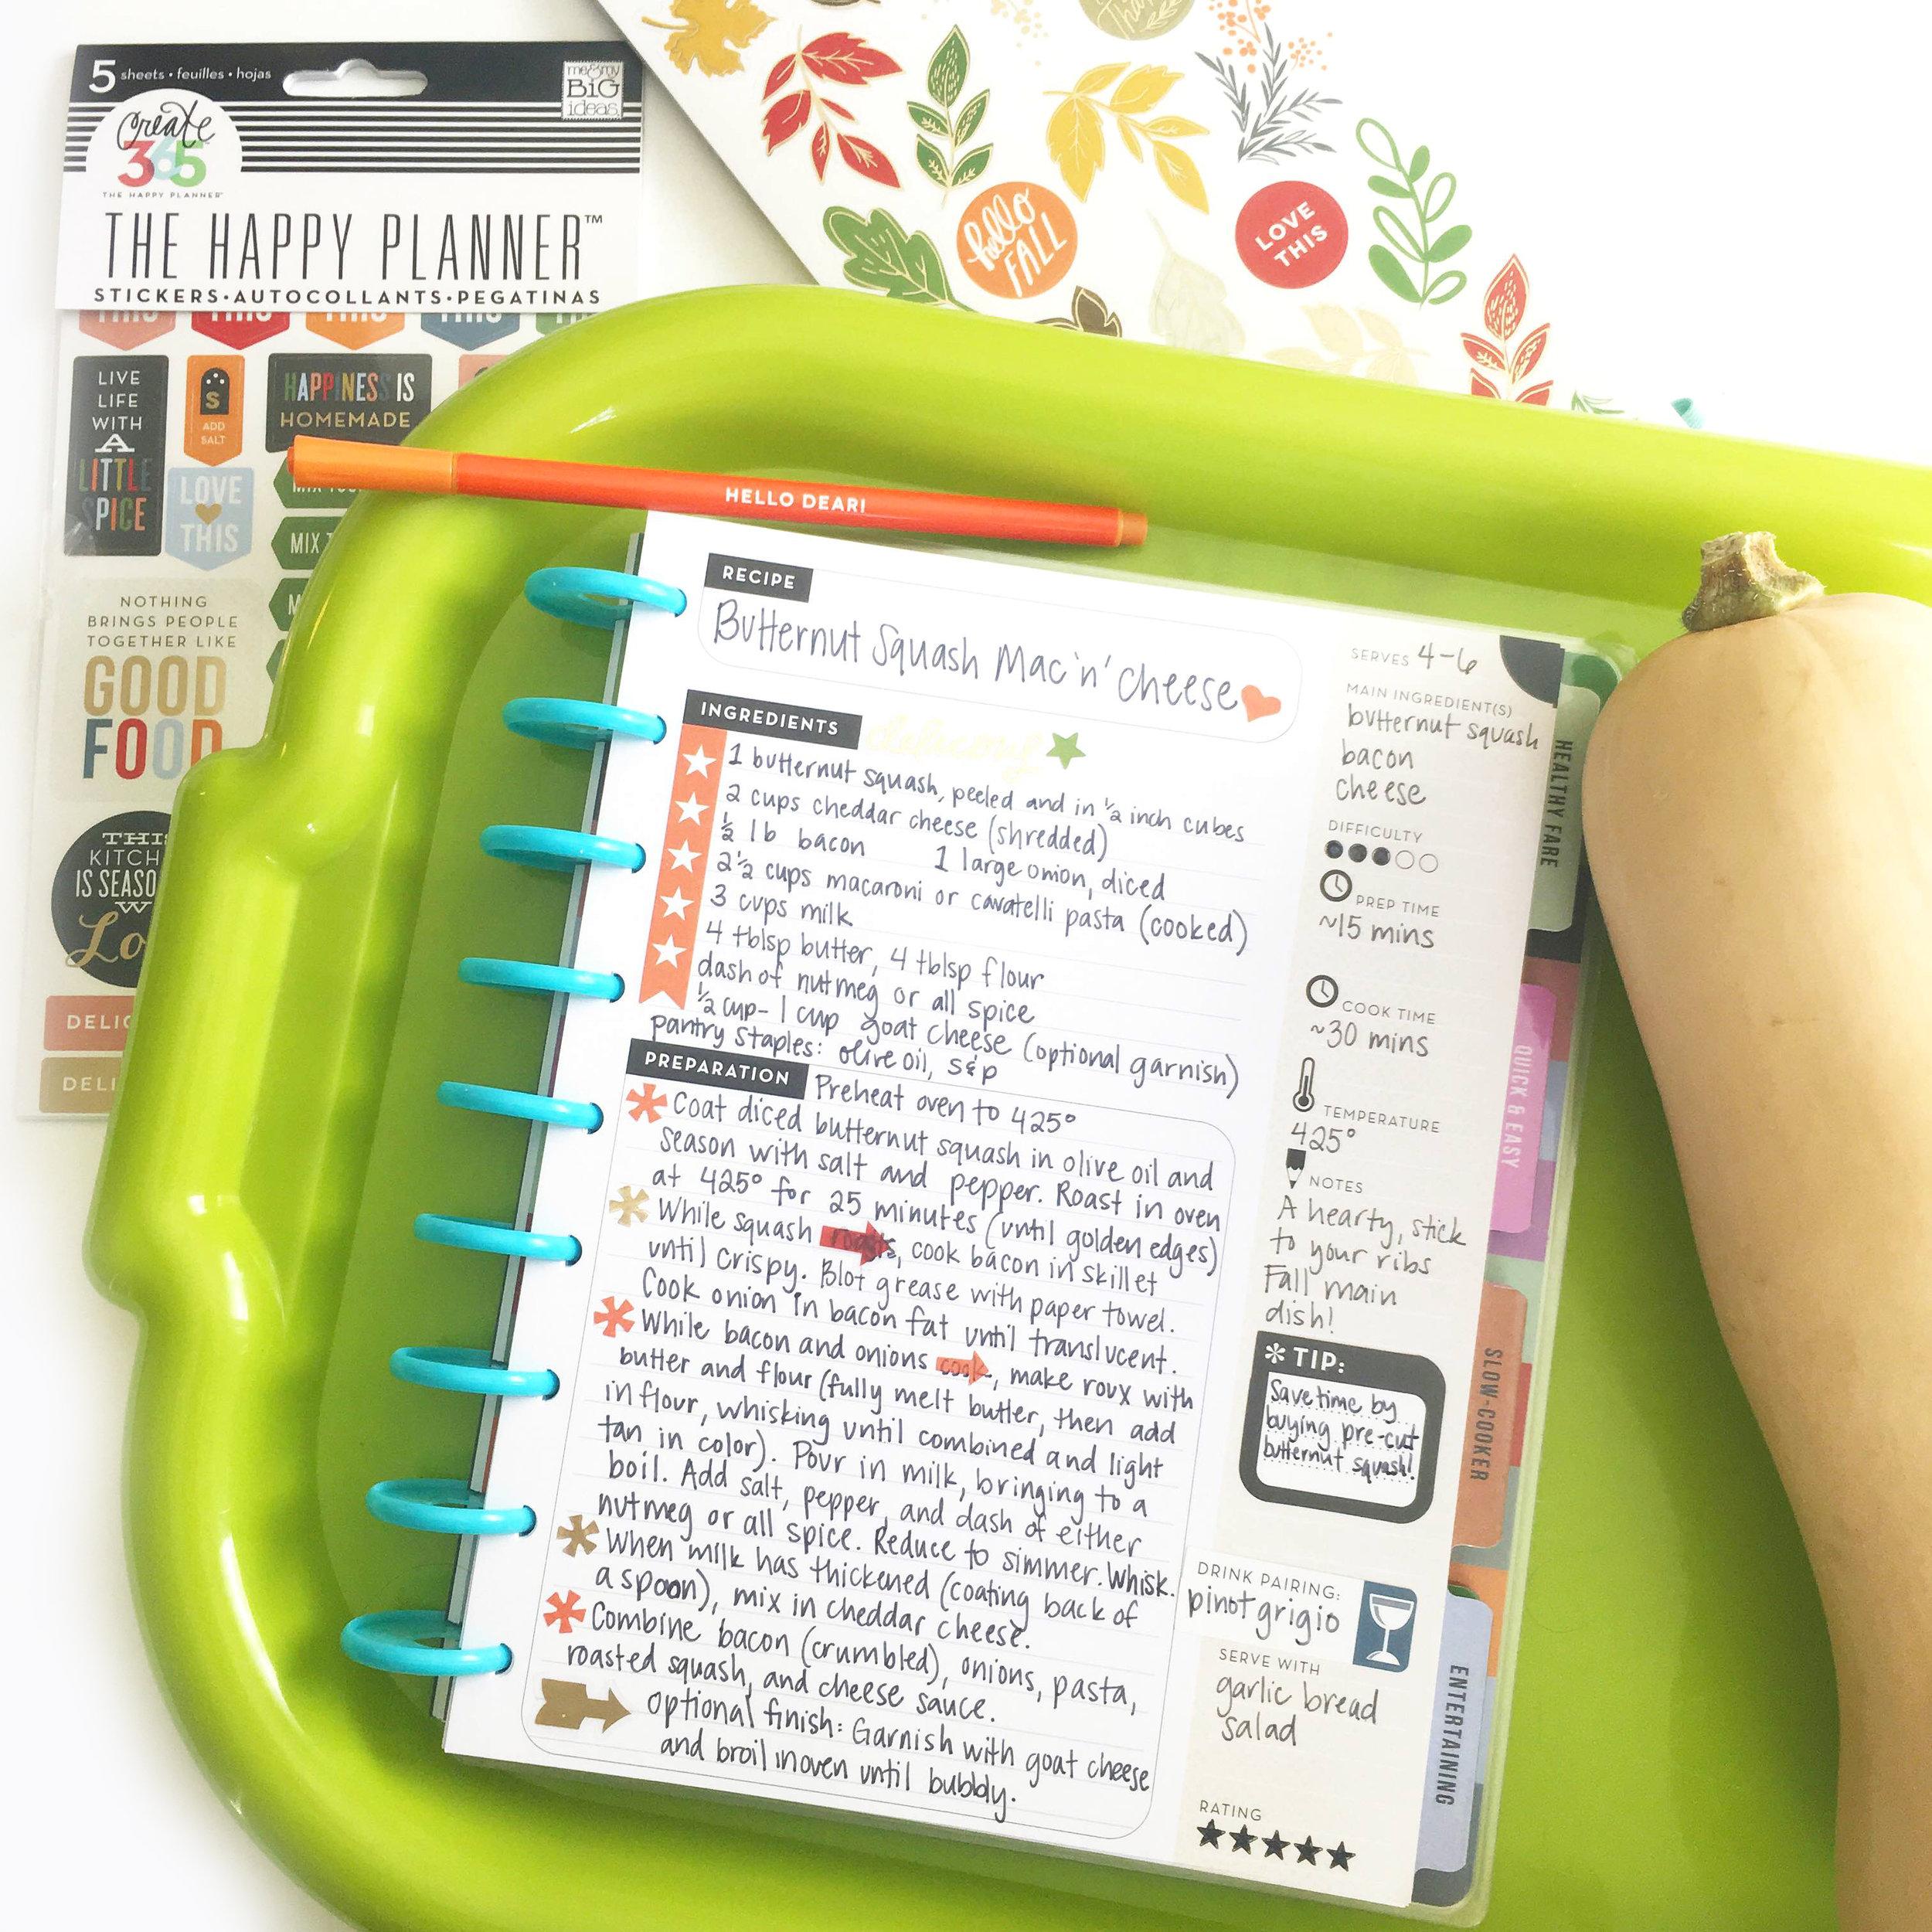 Butternut Squash Mac & Cheese in The Happy Planner™ Recipe Organizer of mambi Design Team member Gretchen Klobucar | me & my BIG ideas